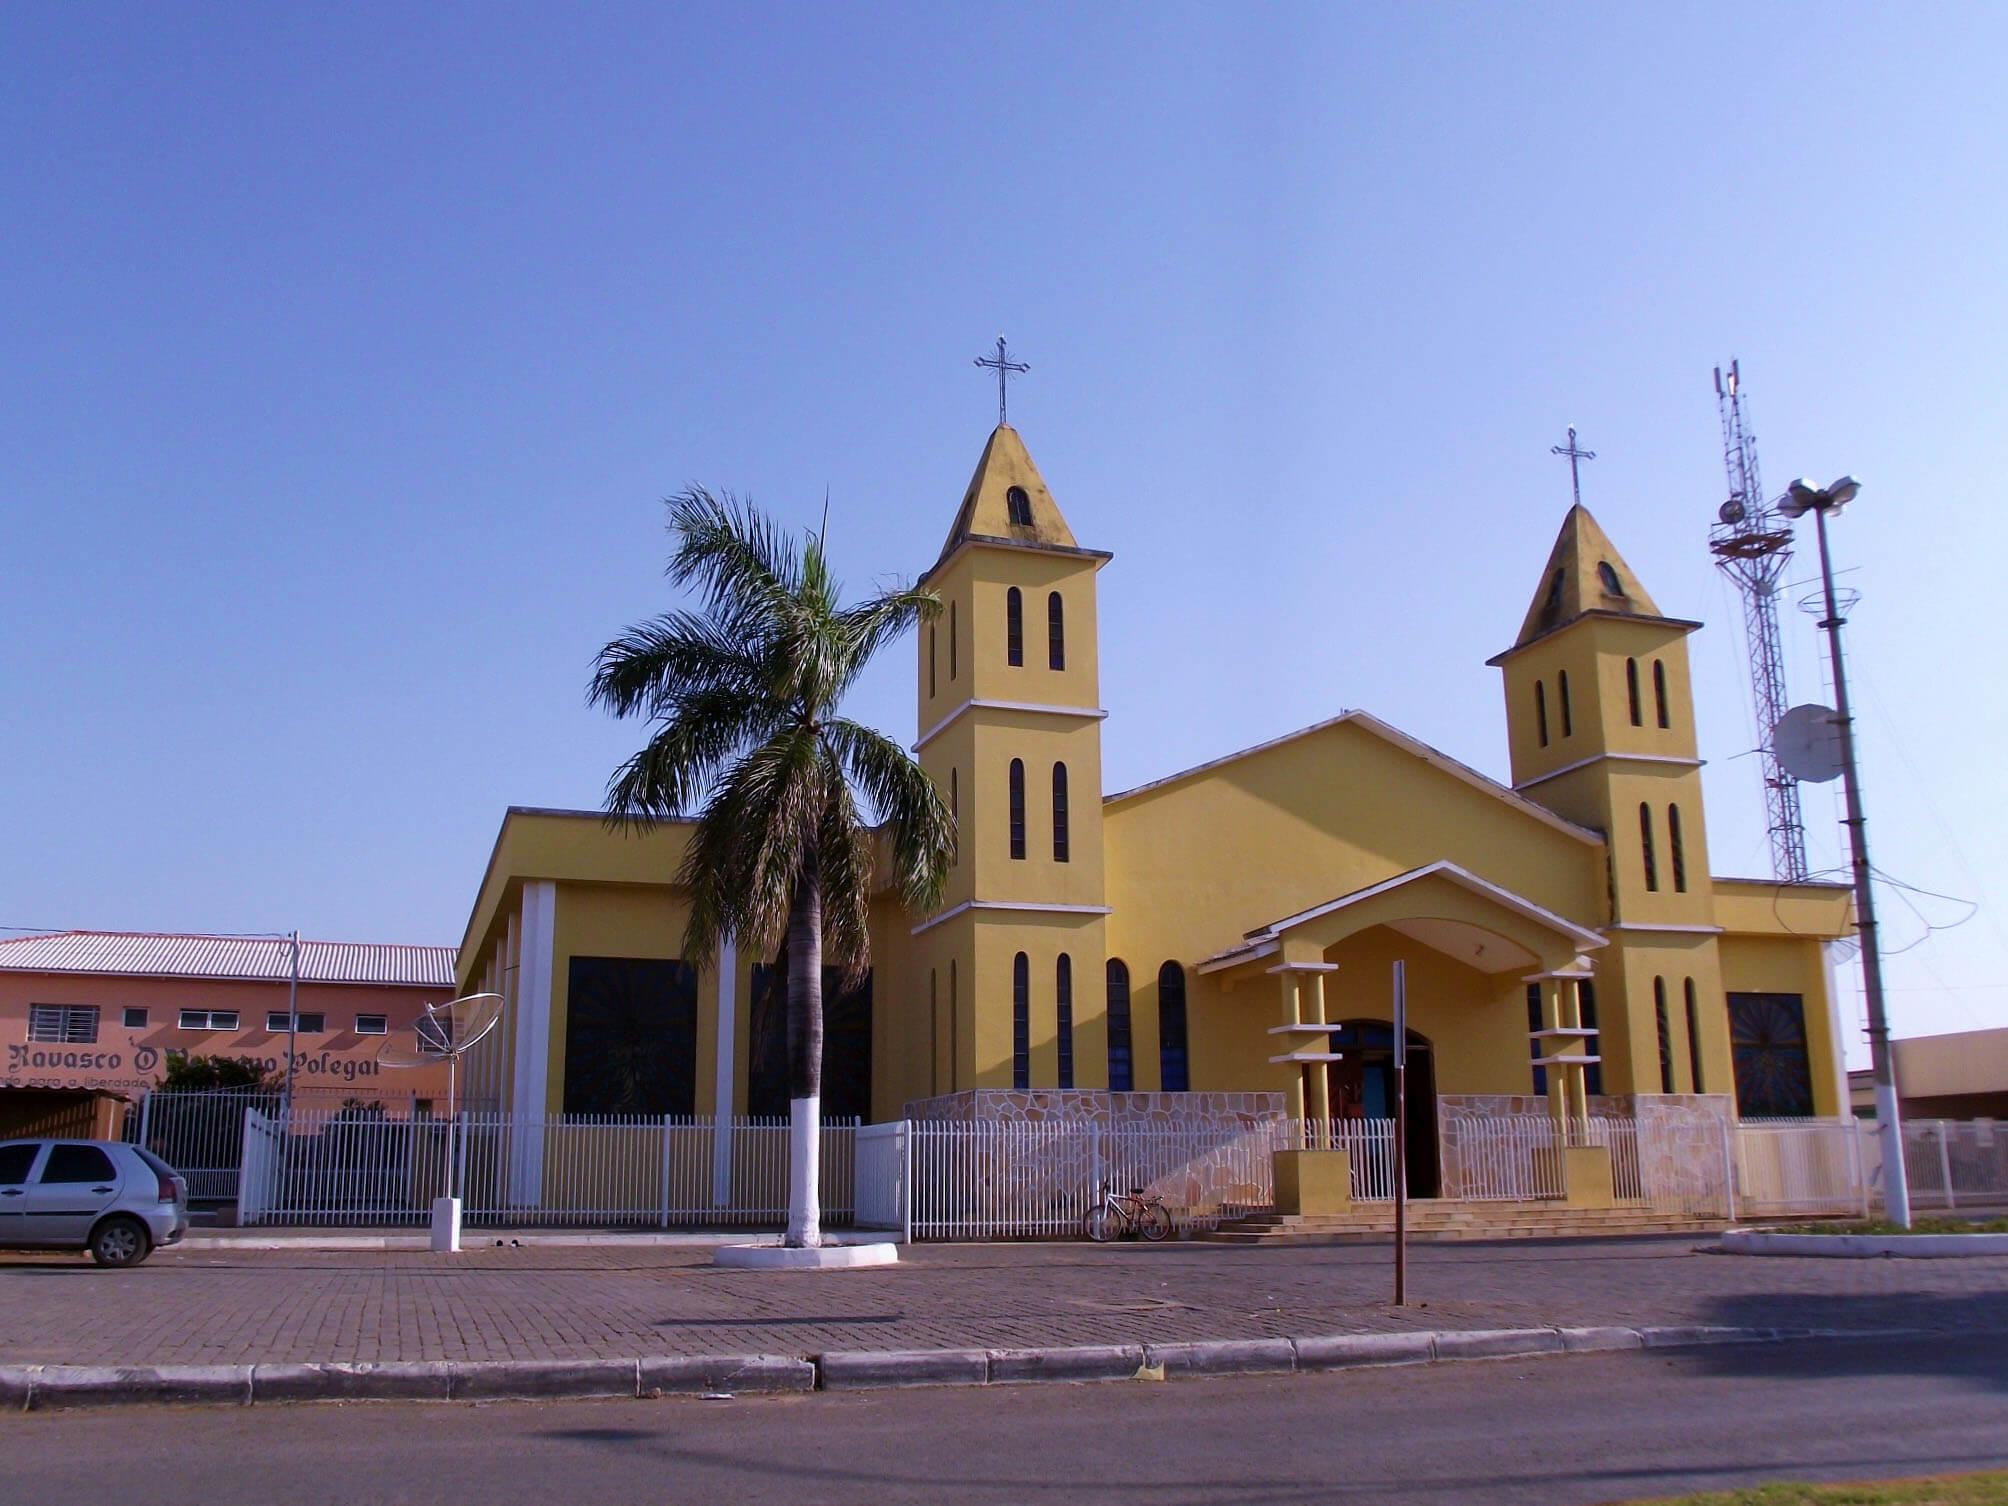 Posse Goiás fonte: static.consolidesuamarca.com.br